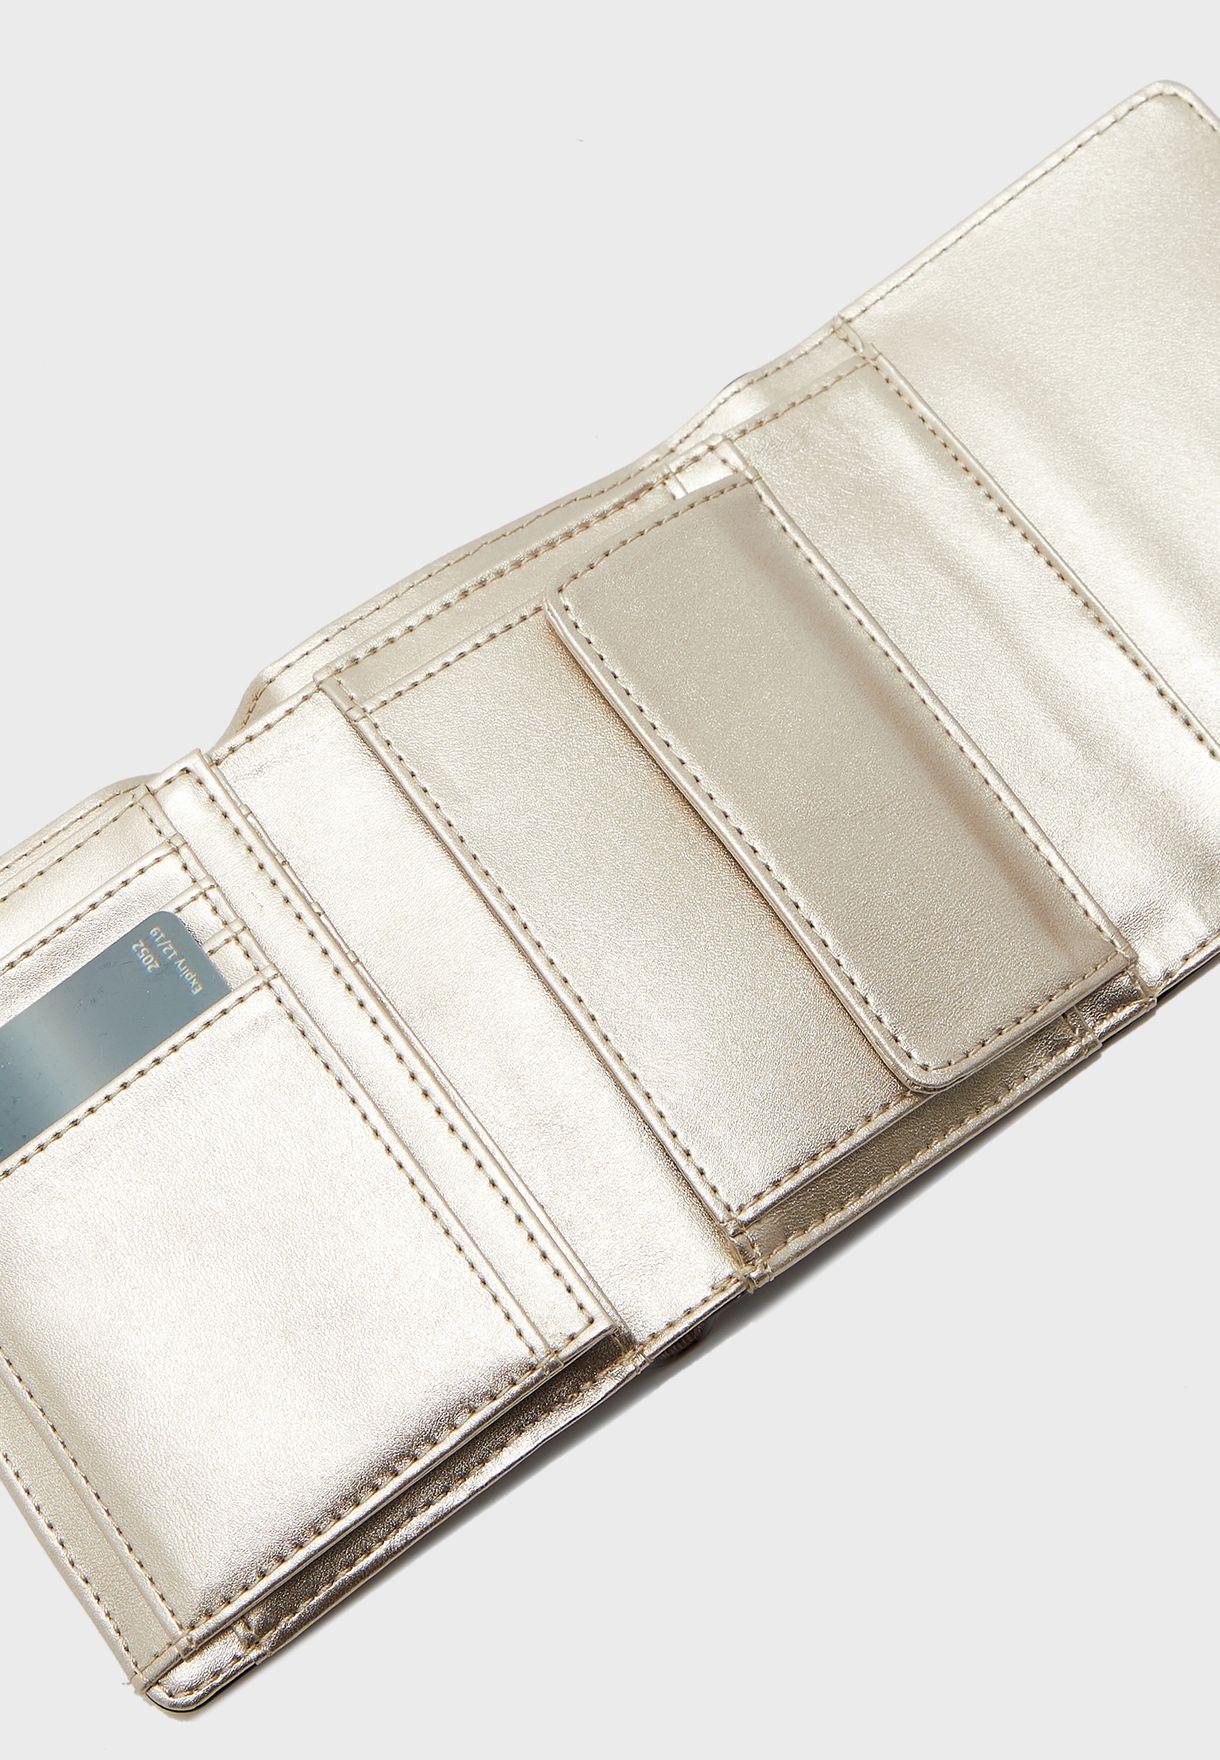 محفظة ذات سحاب